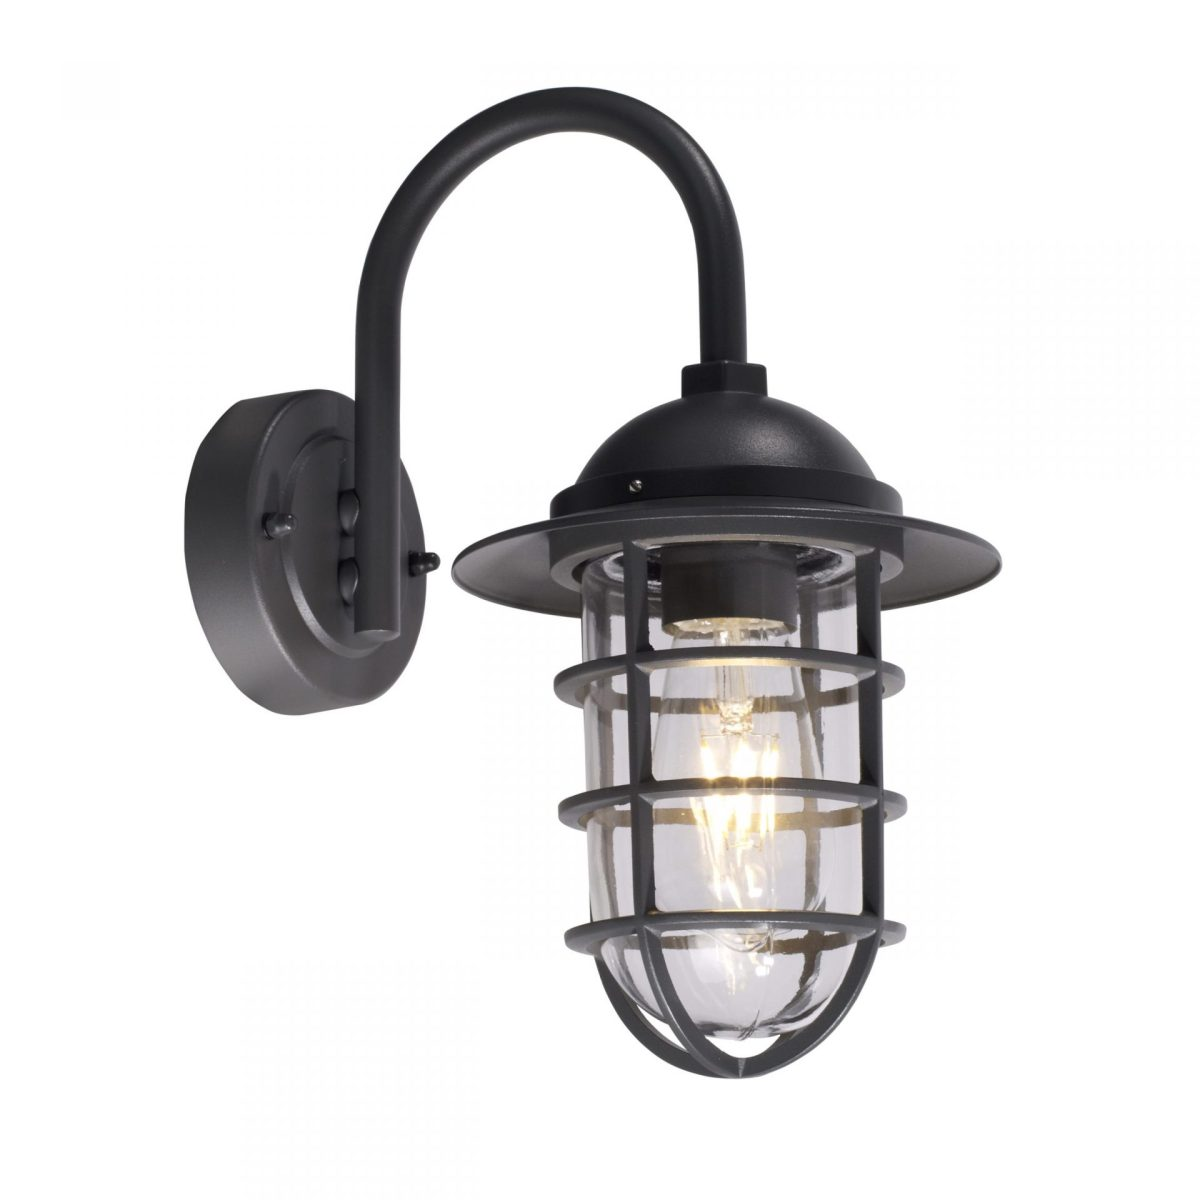 Outdoor Lighting Bulkheads WL-B1 – COMING SOON